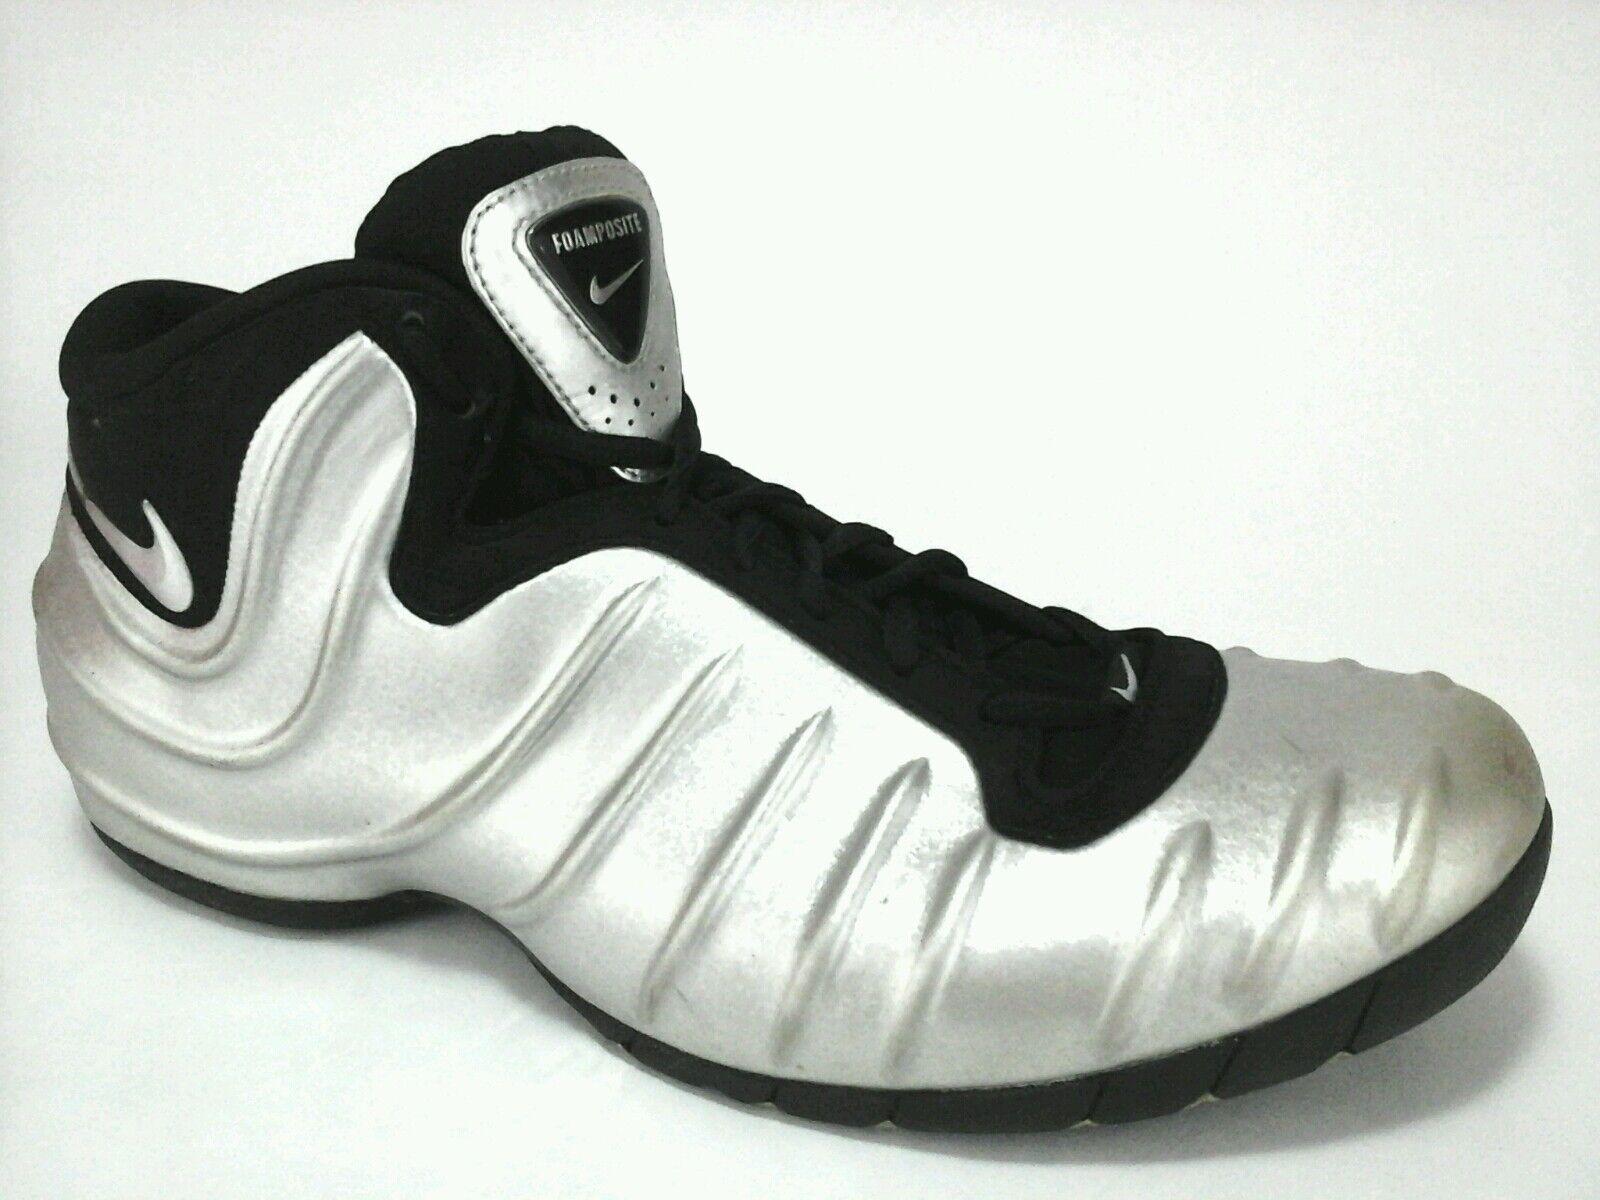 09015c1640 Details about NIKE Air FOAMPOSITE Metallic Silver Black Sneakers Shoes Mens  US 14 EU 48.5 RARE